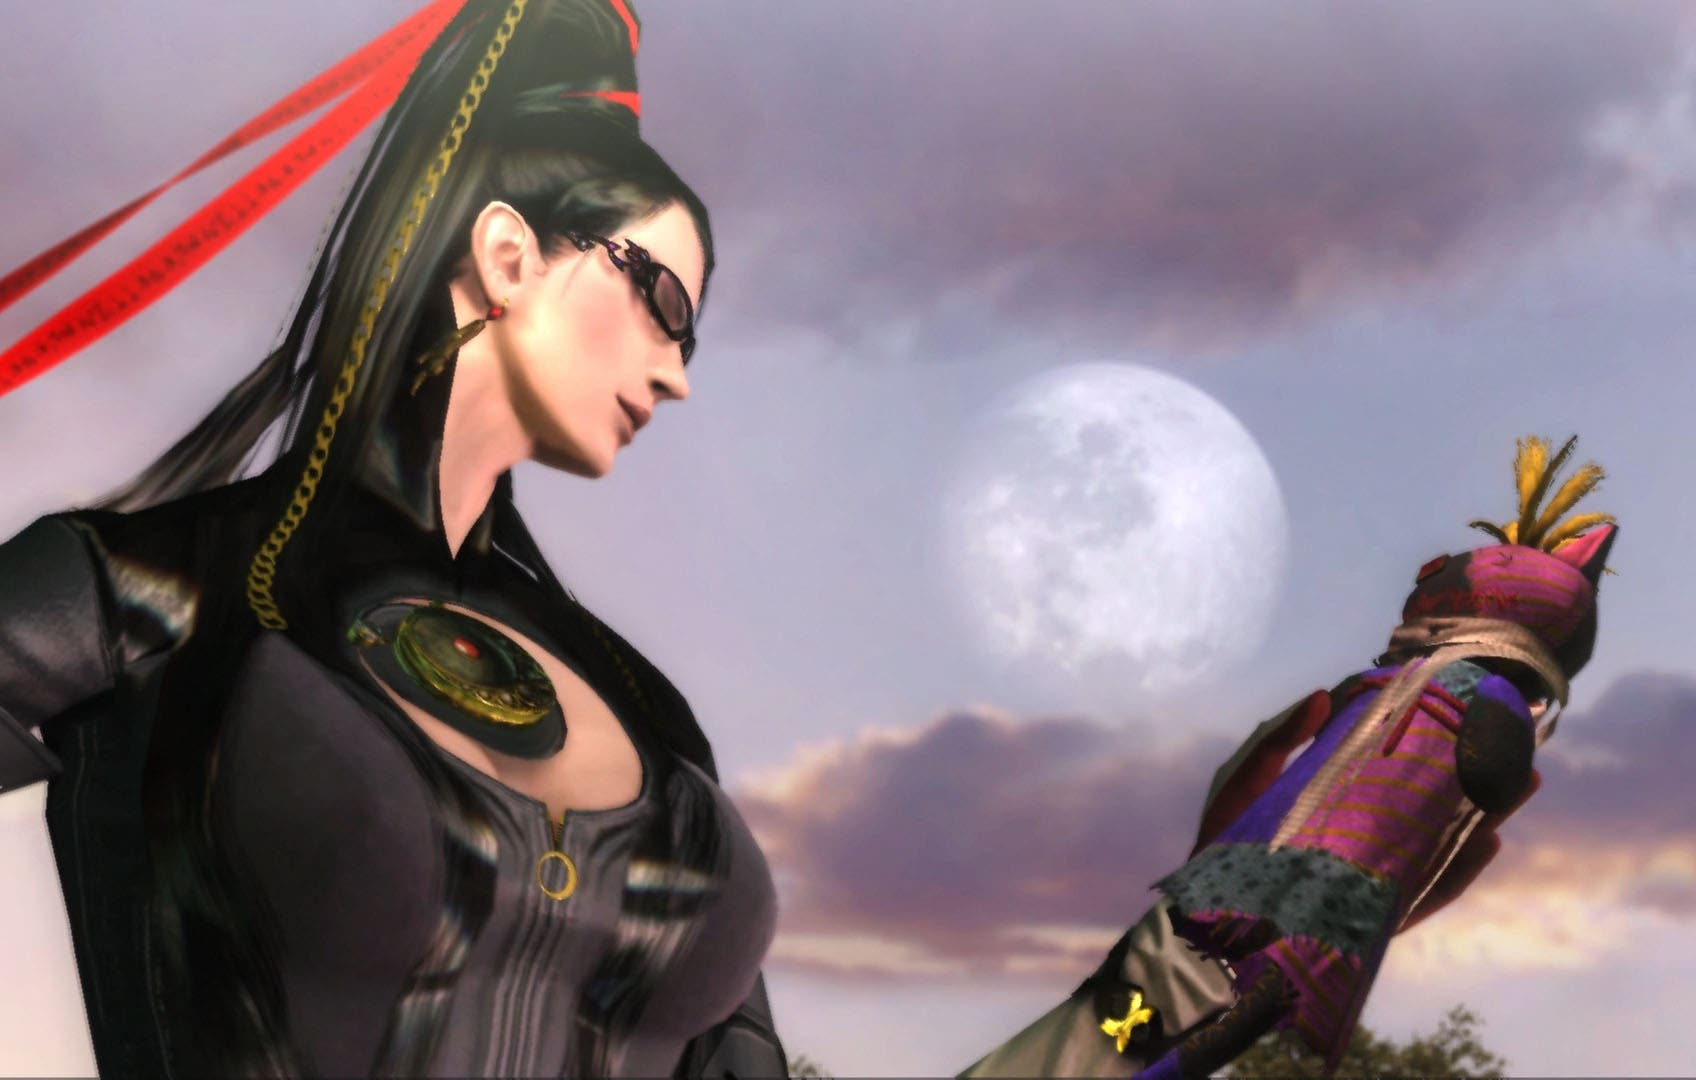 Análisis de Bayonetta & Vanquish 10th Anniversary Bundle - Xbox One 2